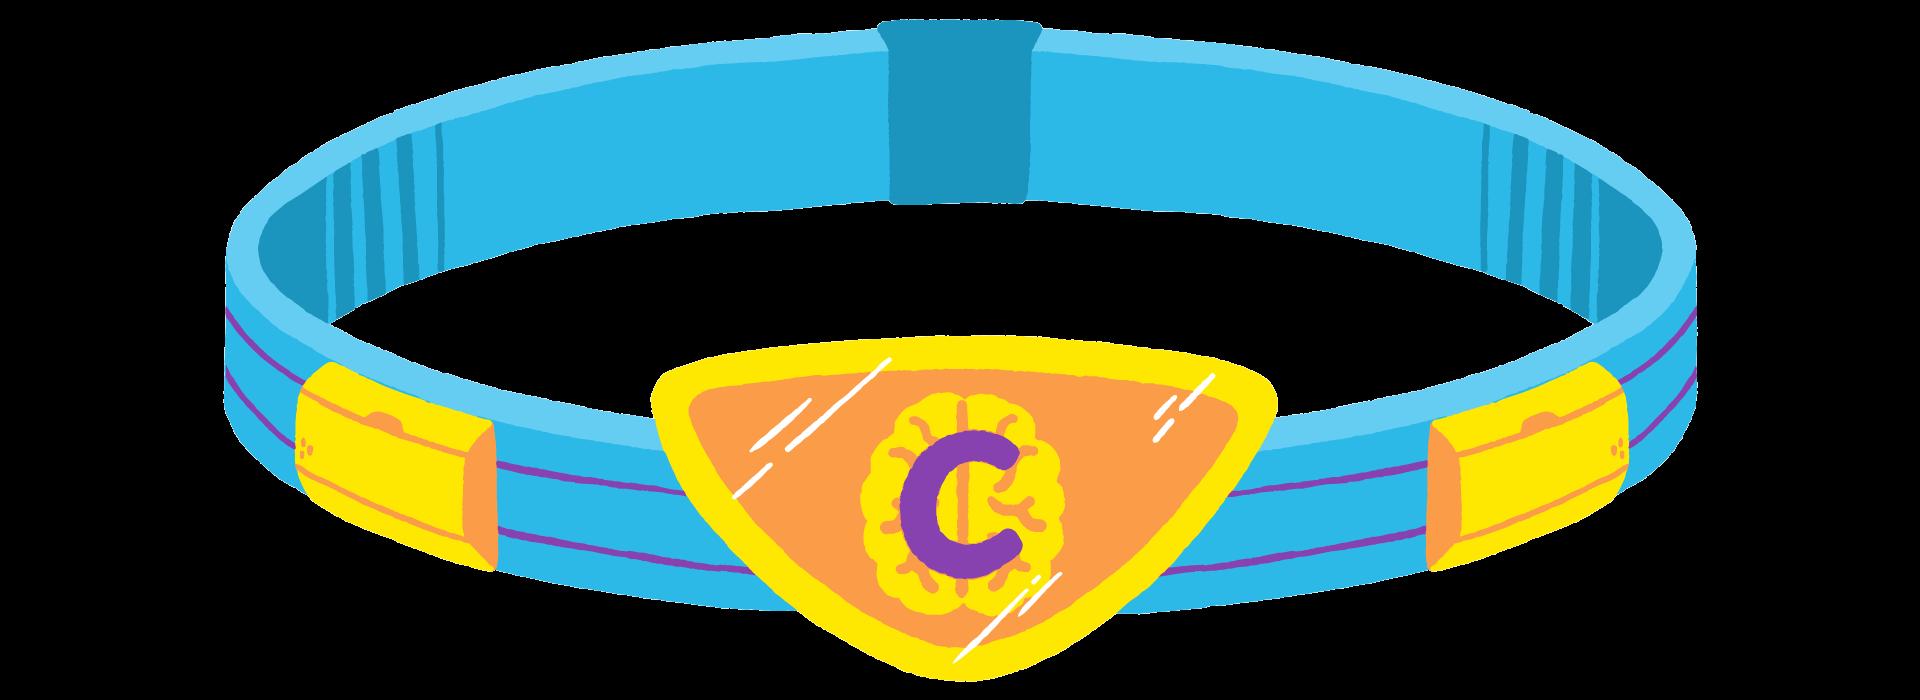 Utility-Belt-Clean